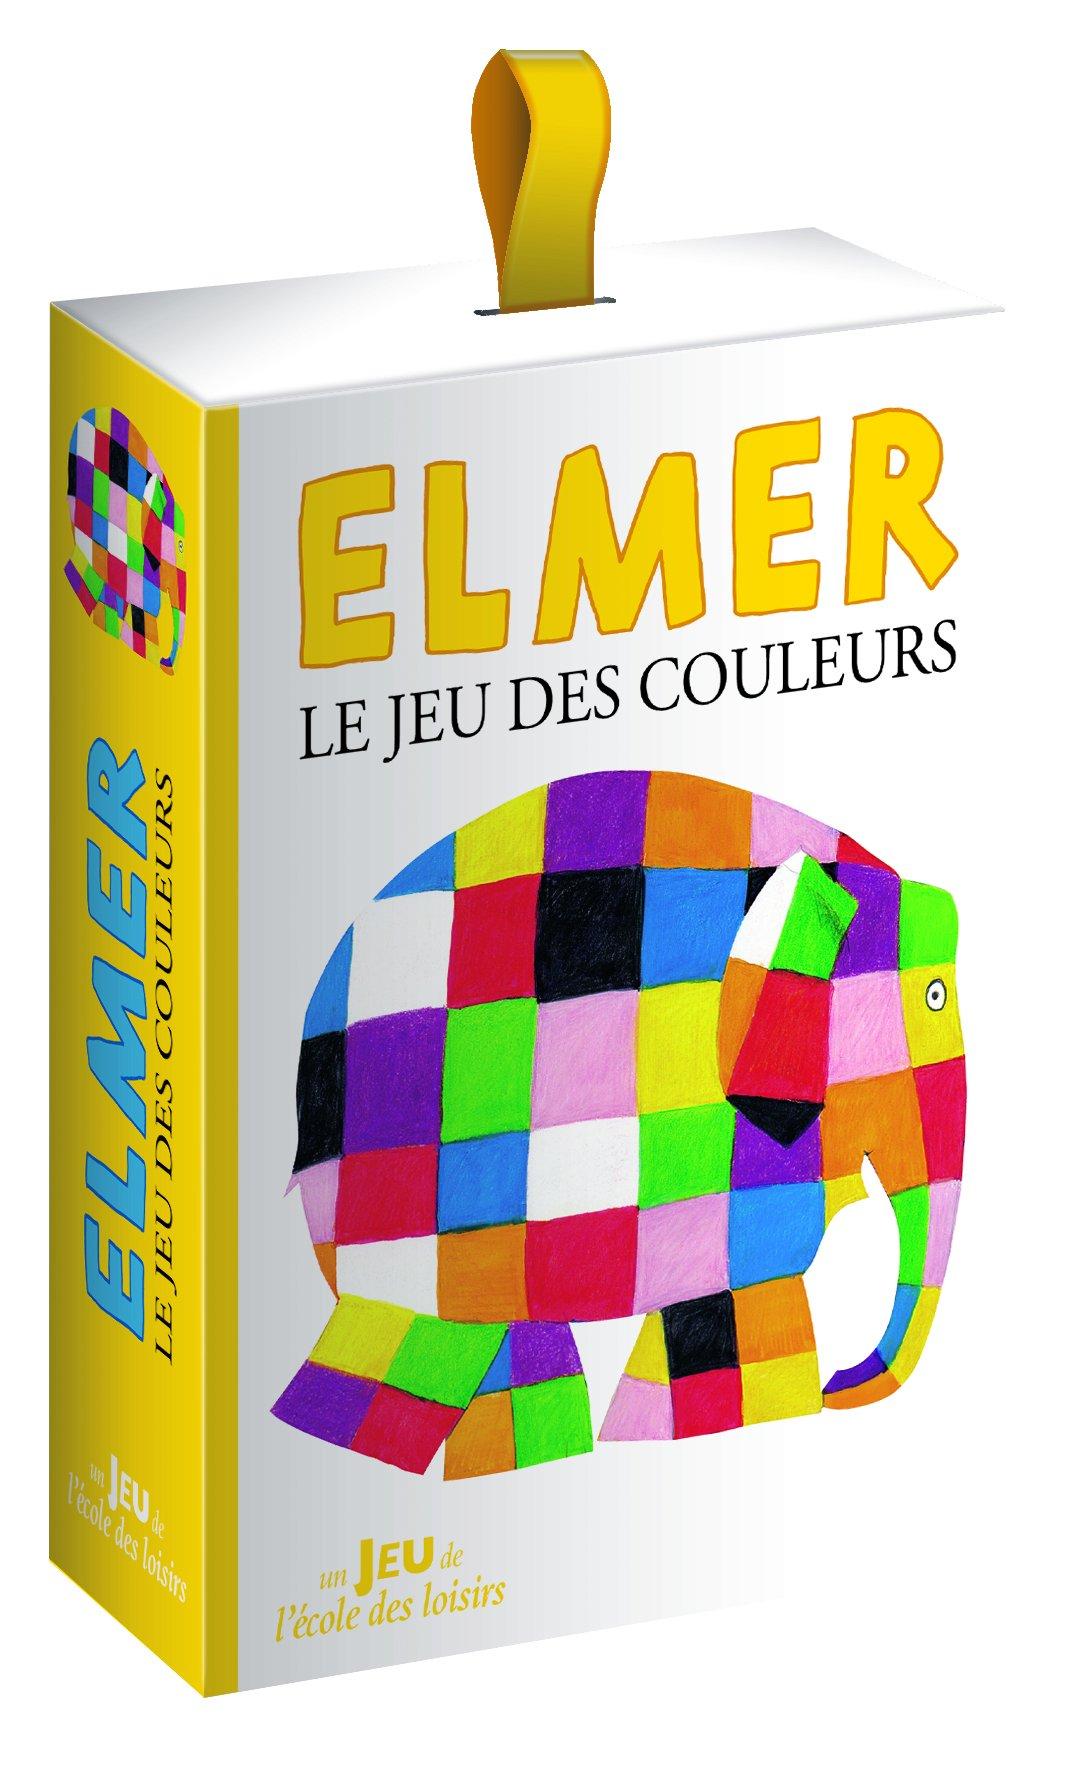 Elmer le jeu des couleurs: Amazon.es: Mckee David: Libros en idiomas extranjeros